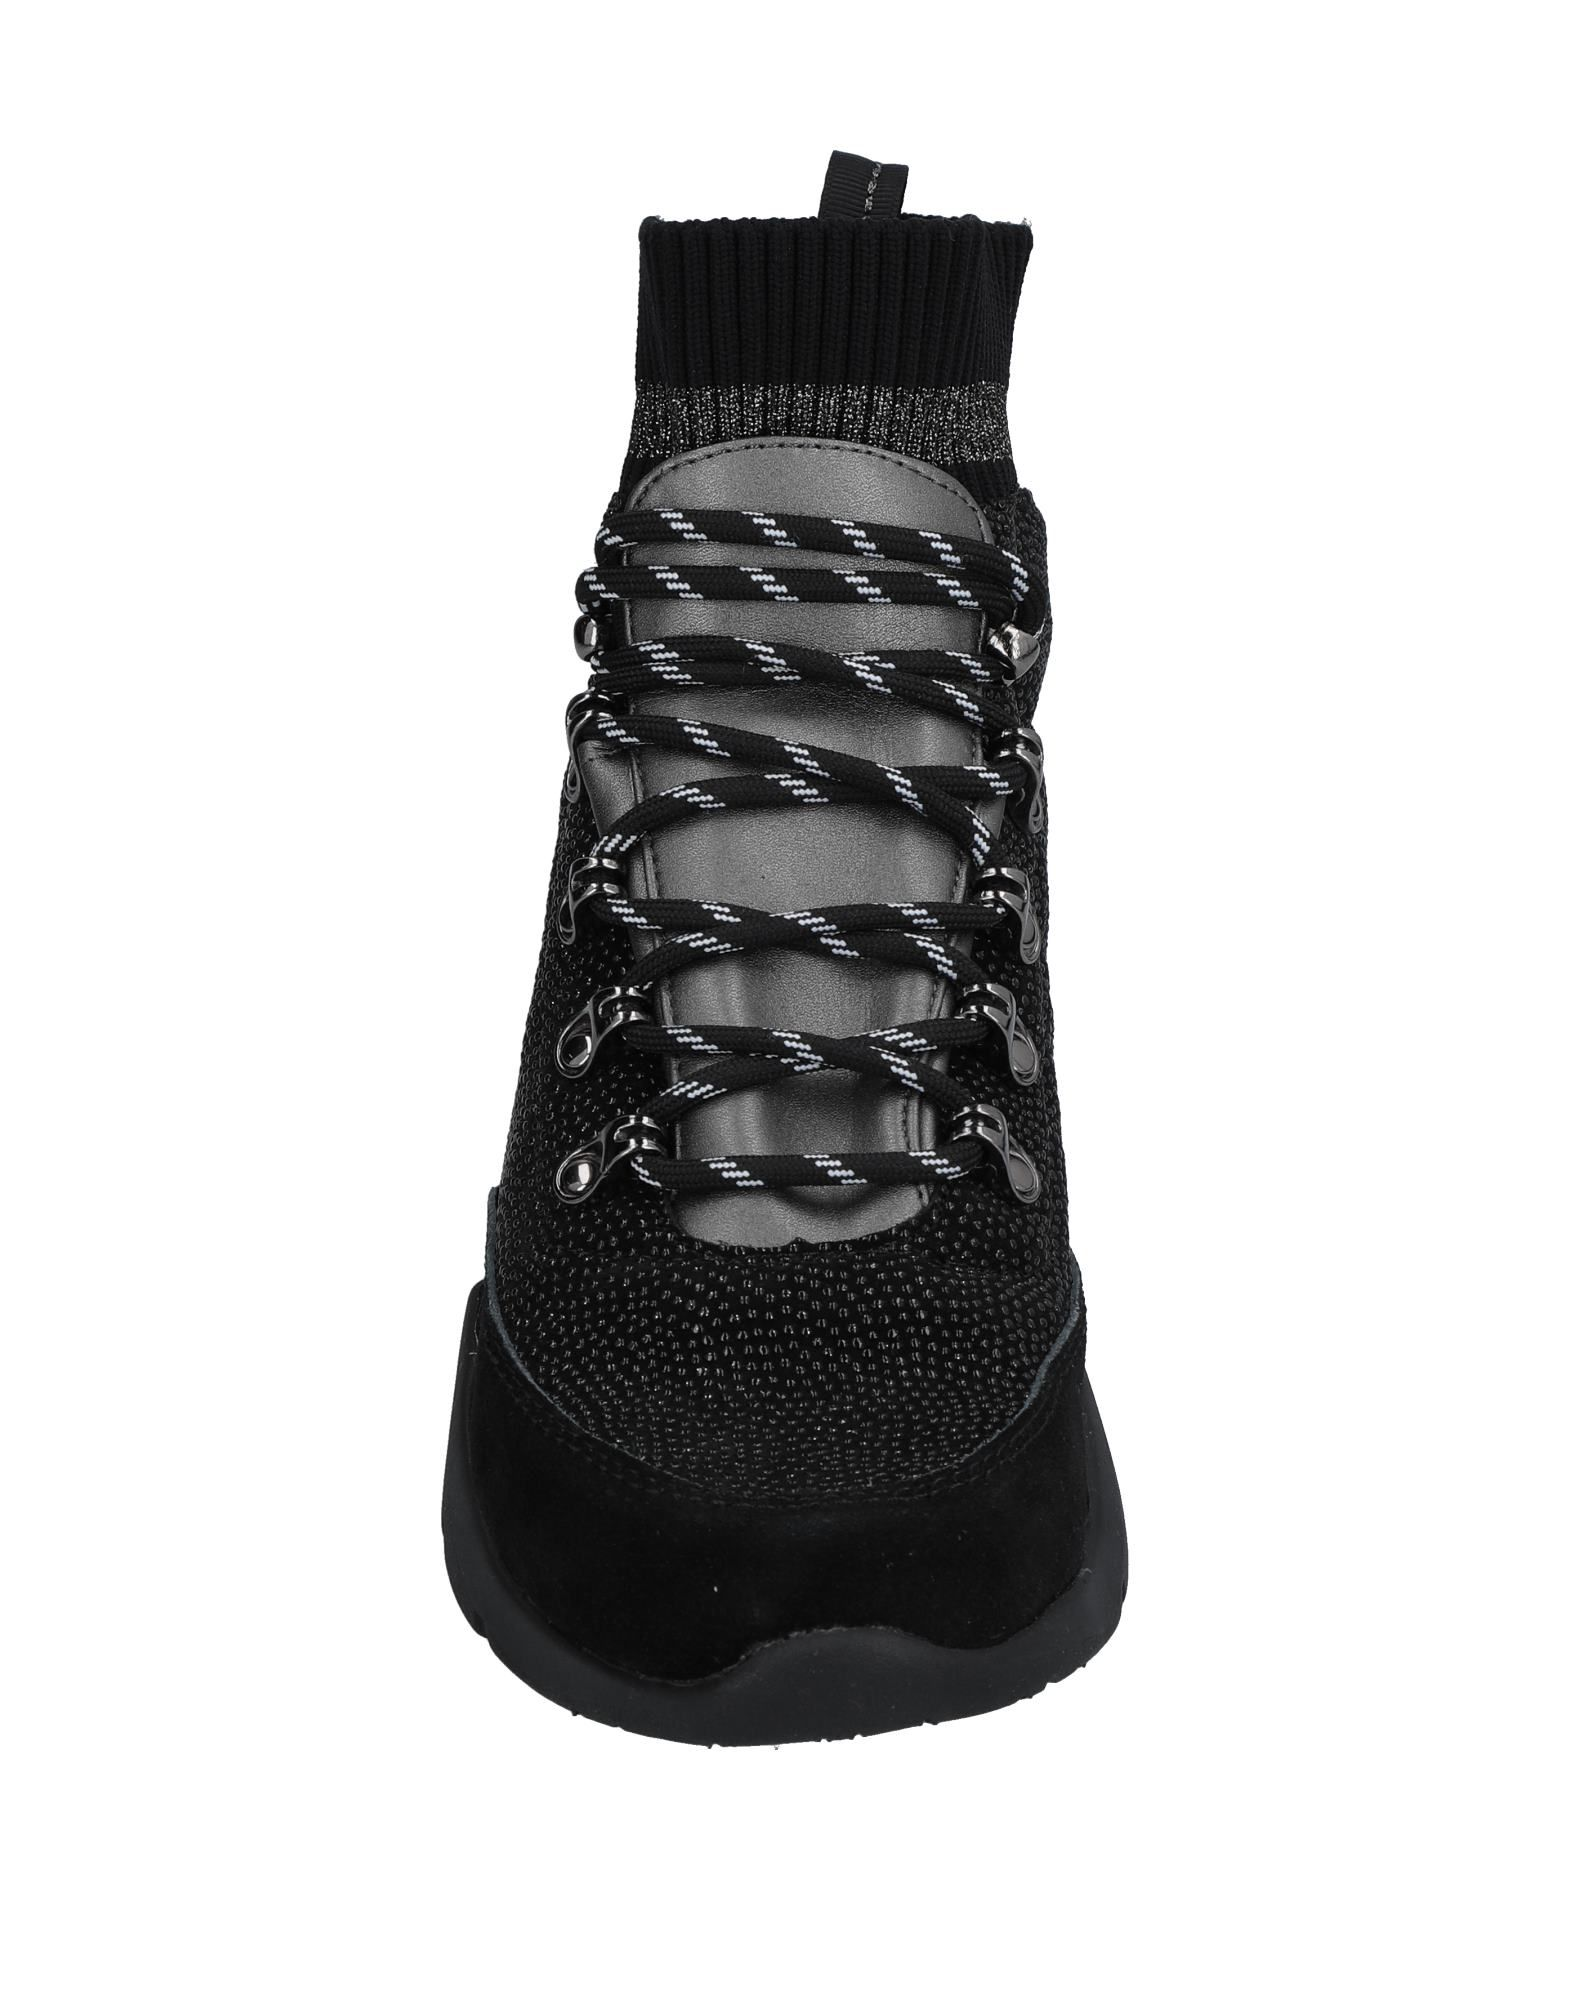 Roberto 11530264NP Della Croce Sneakers Damen  11530264NP Roberto Gute Qualität beliebte Schuhe 9c9f0a